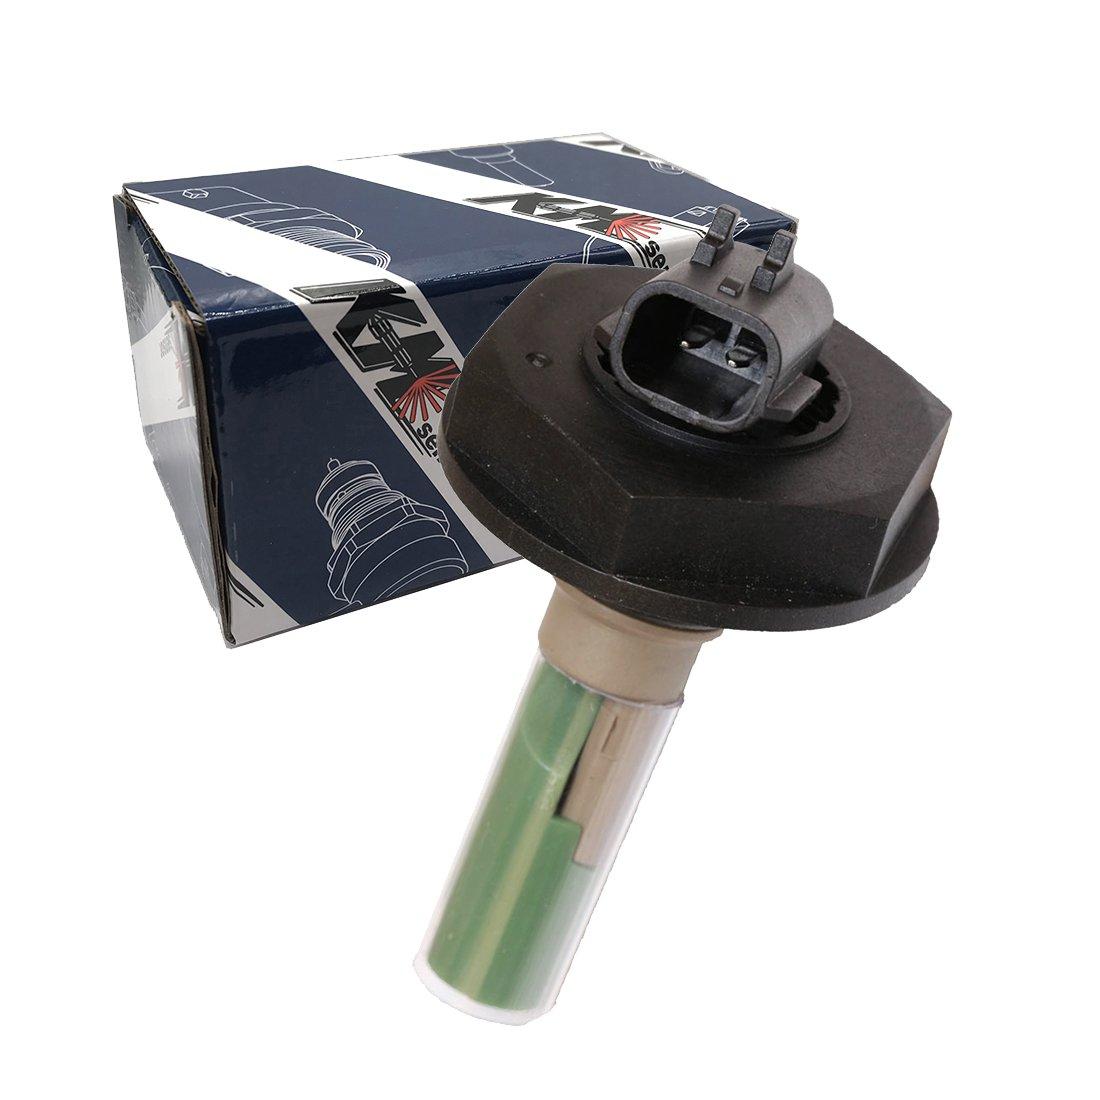 06-62384-002 Coolant Fluid Level Sensor fit Cascadia Coolant Sensor Freightliner Columbia